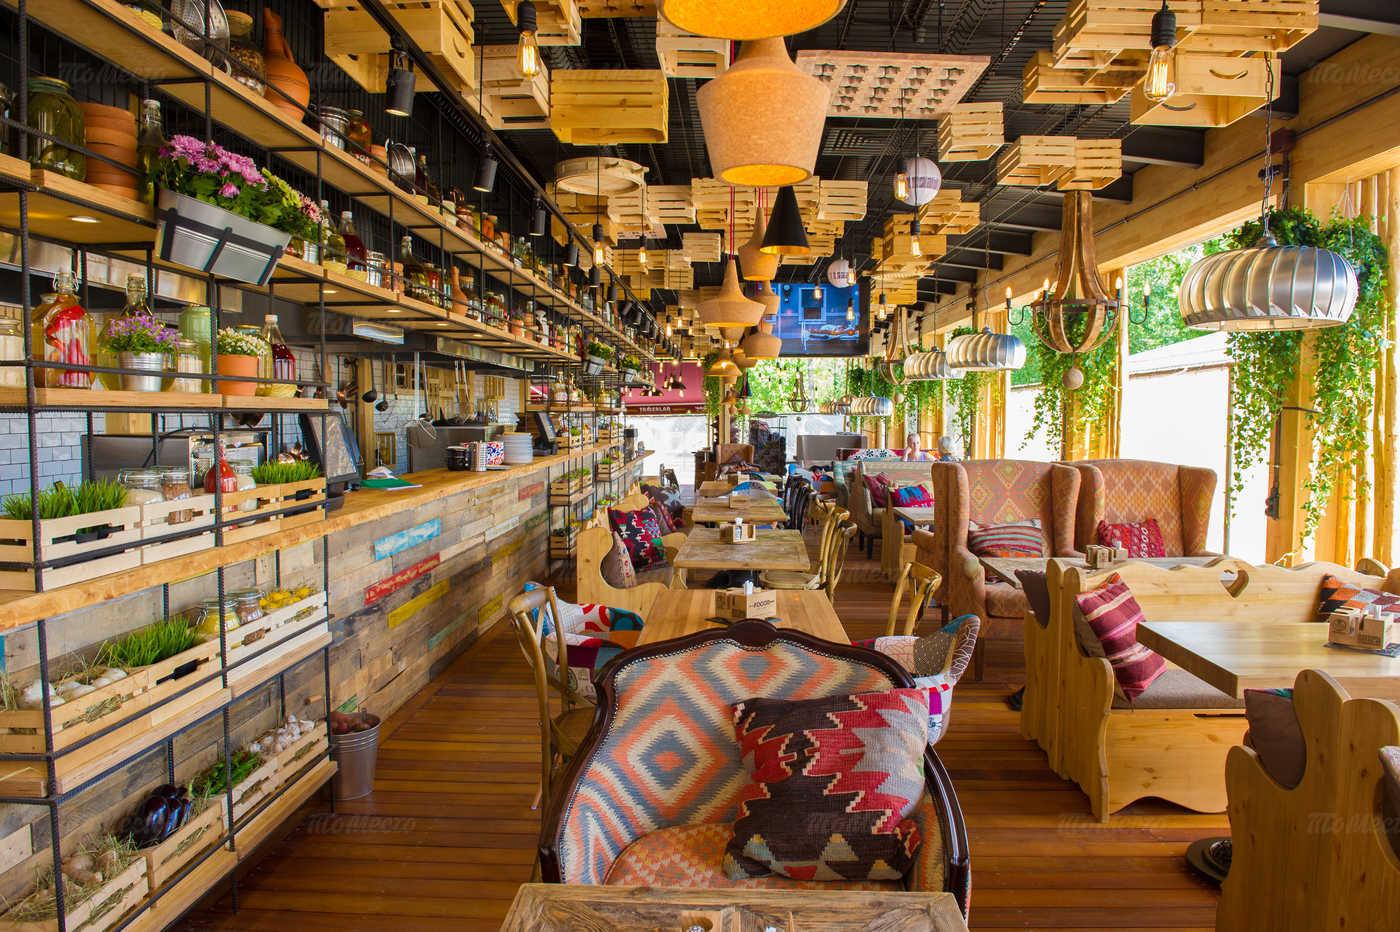 Банкеты ресторана FOOD BAZAR (Фуд базар) на улице Каретный Ряд фото 4